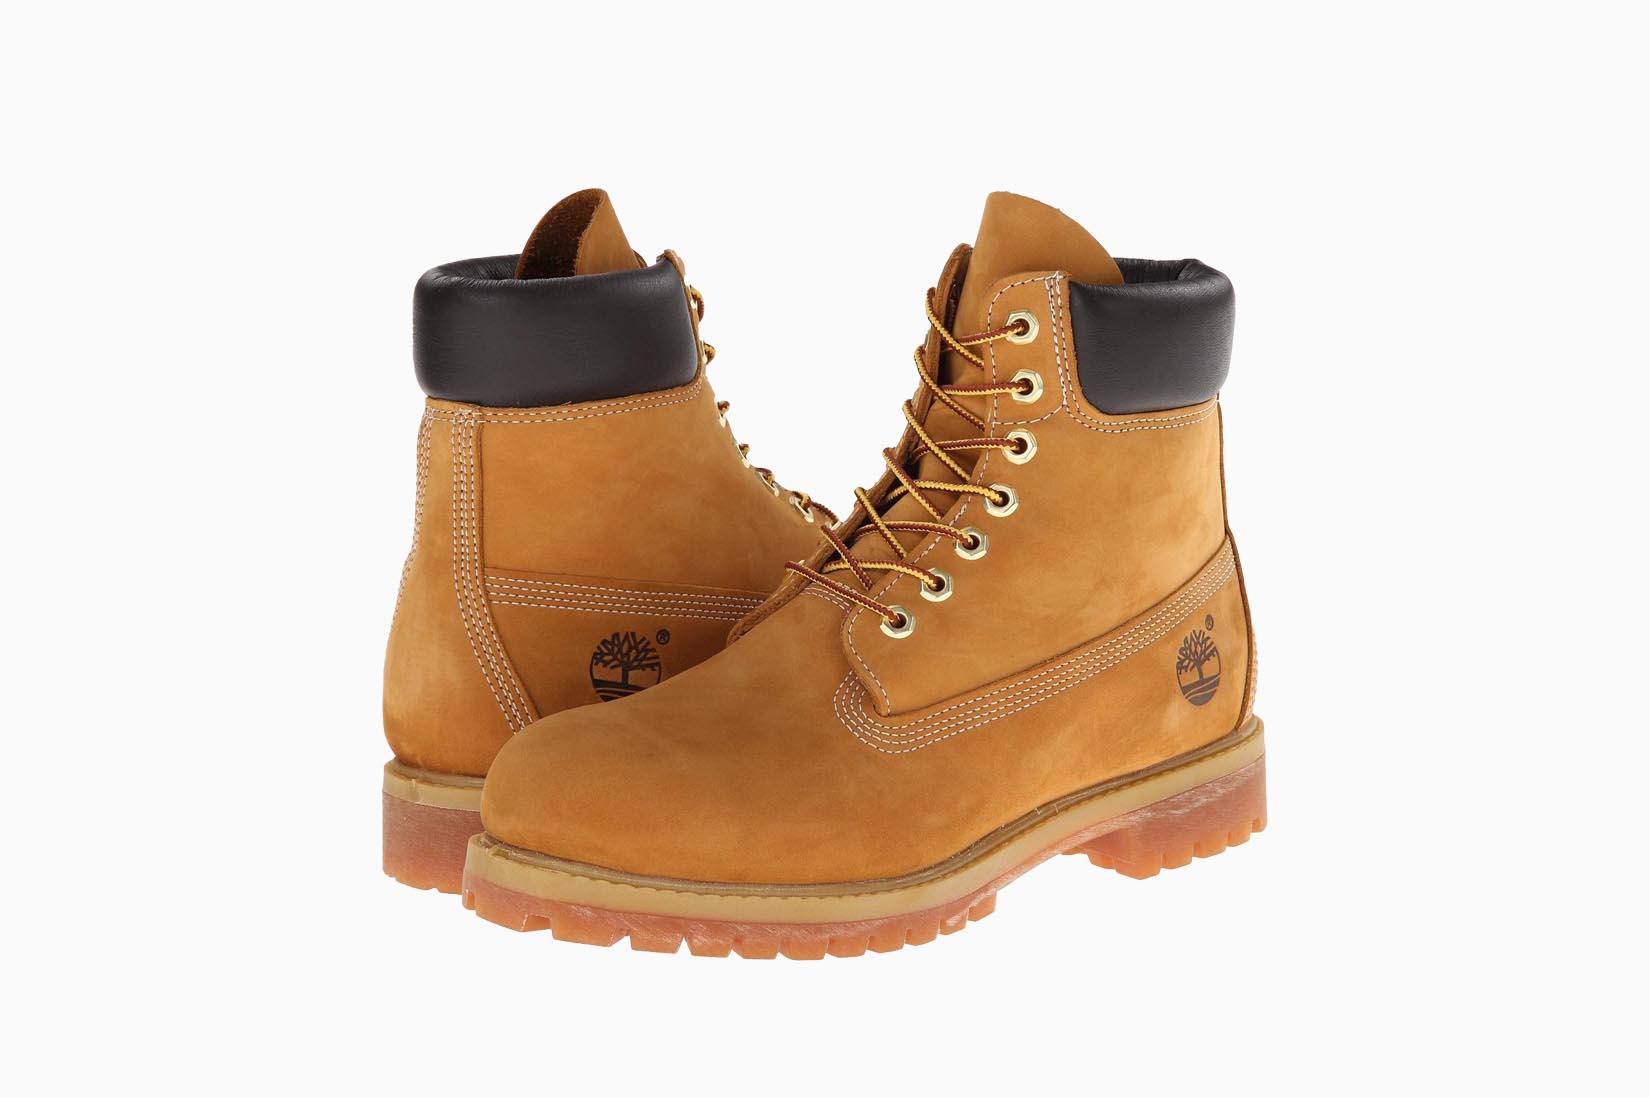 best boots men timberland waterproof boot review Luxe Digital